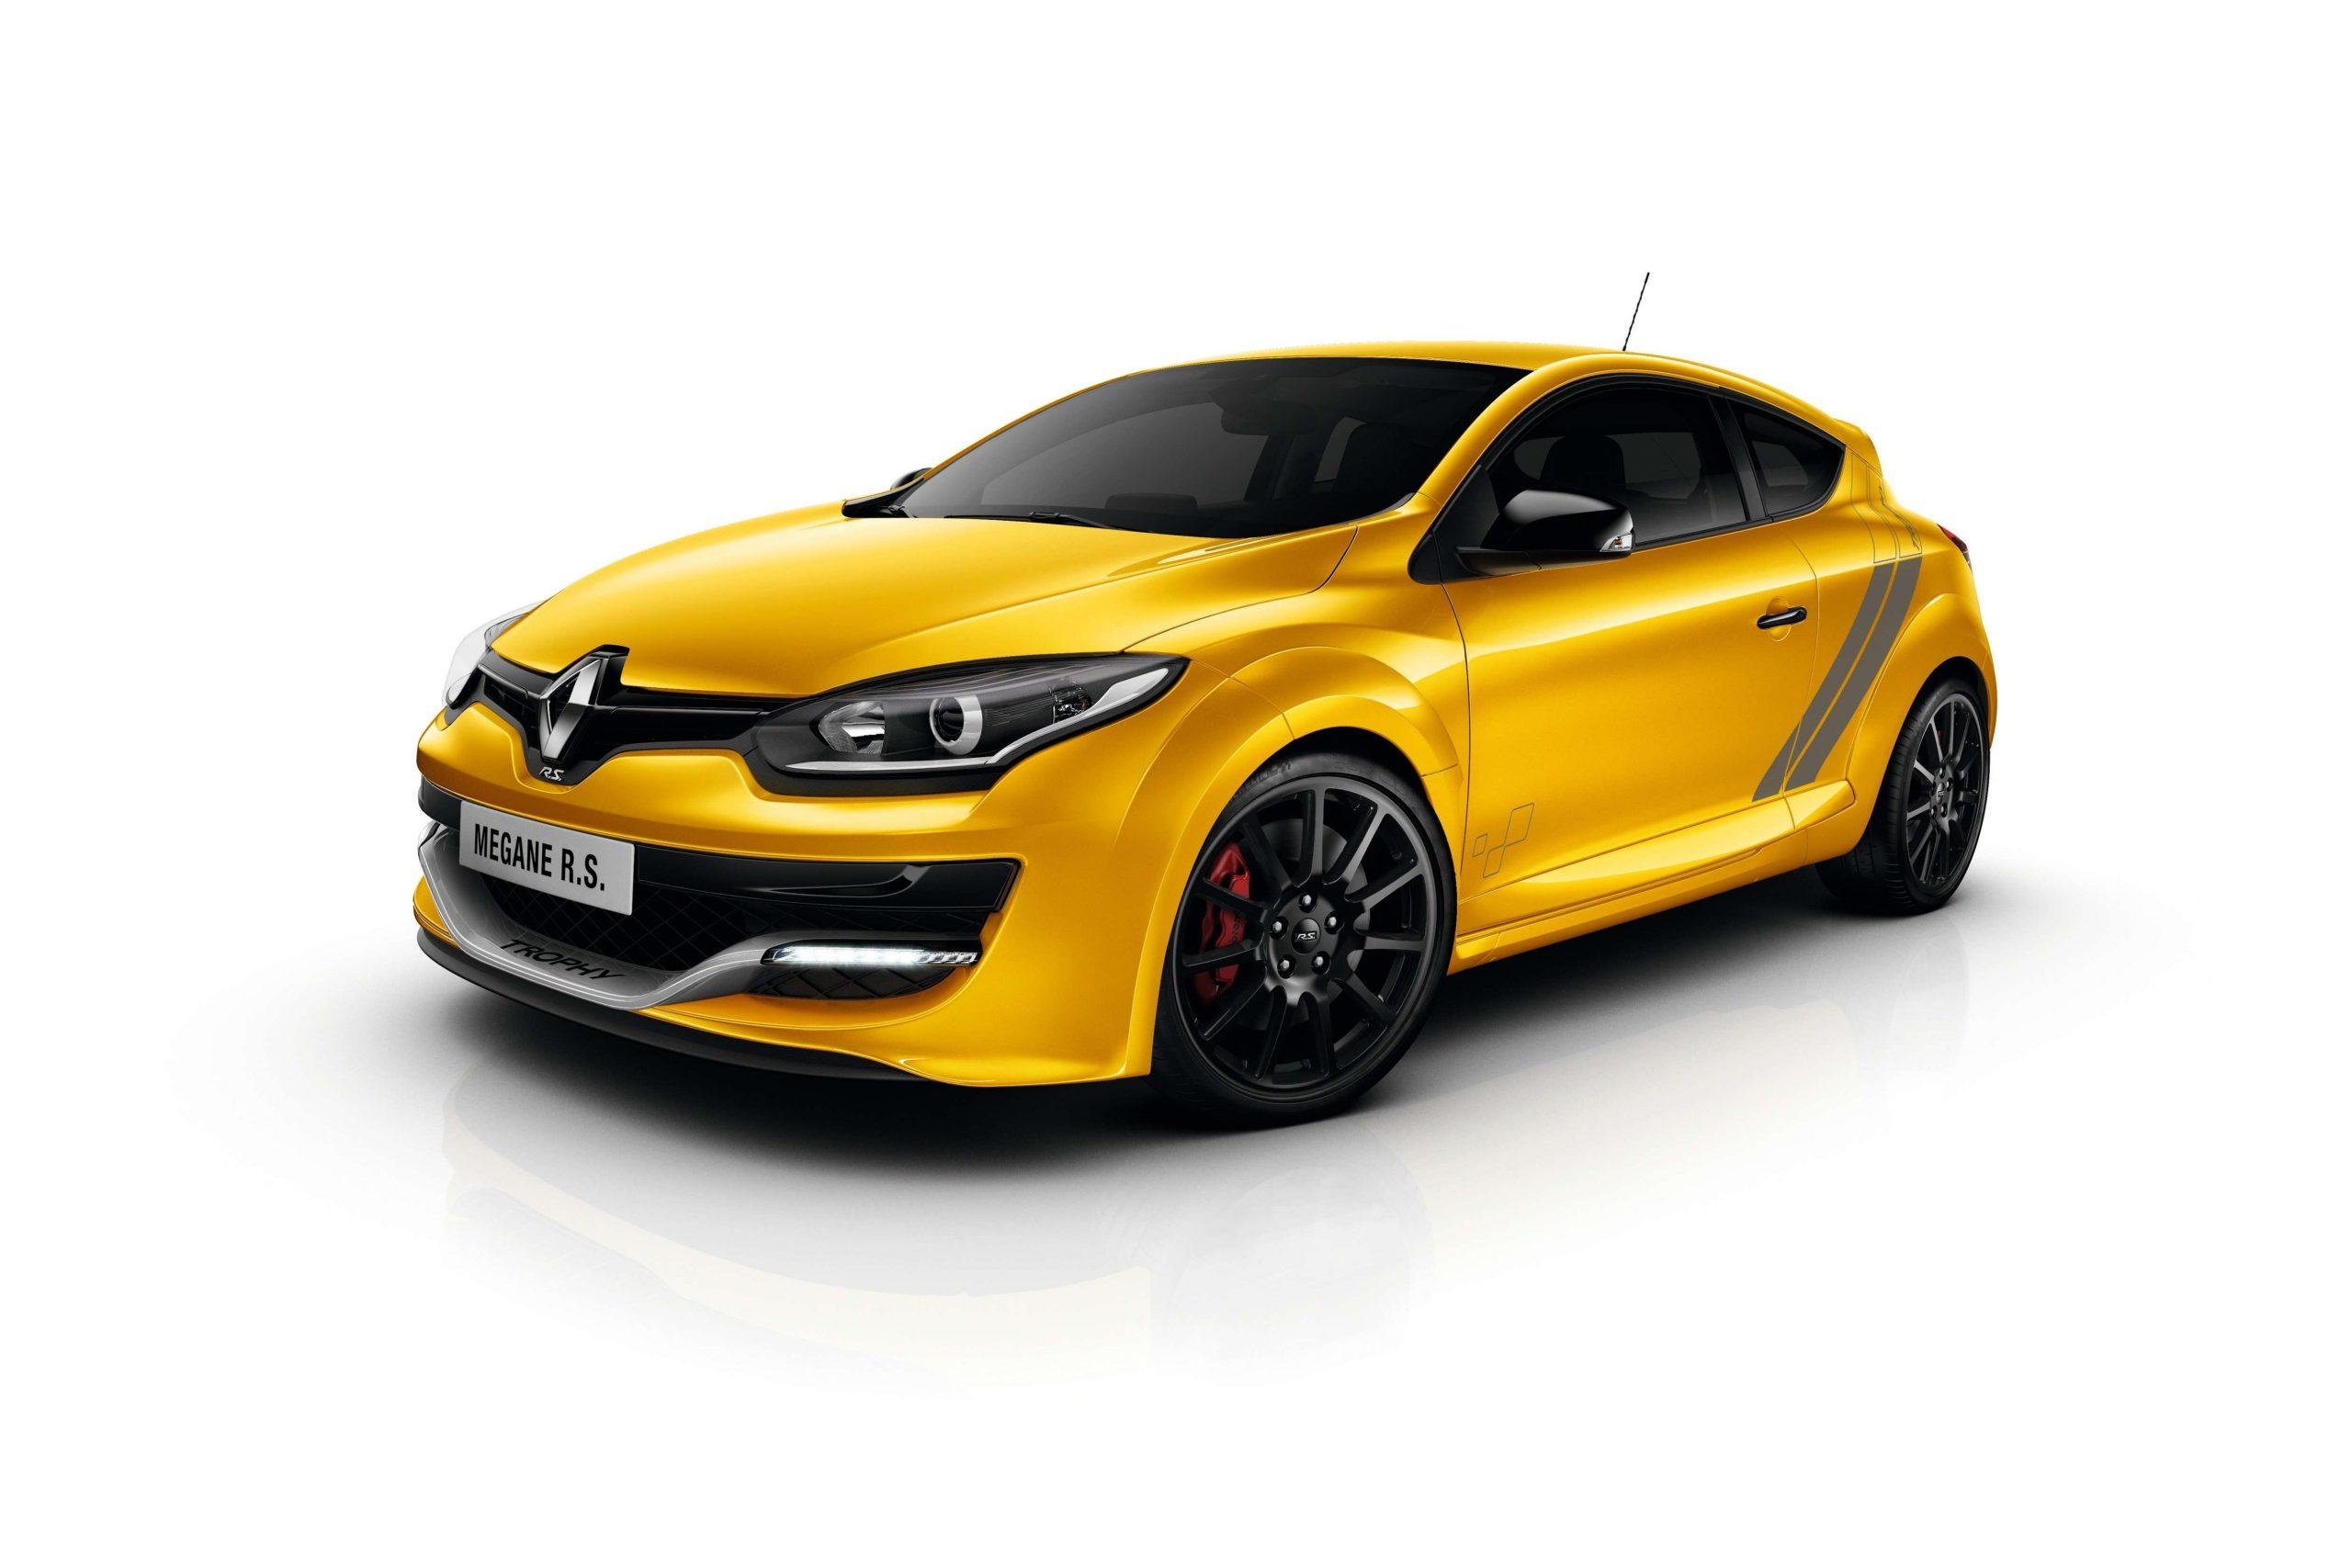 Renault Releases Racier Megane: Latest News